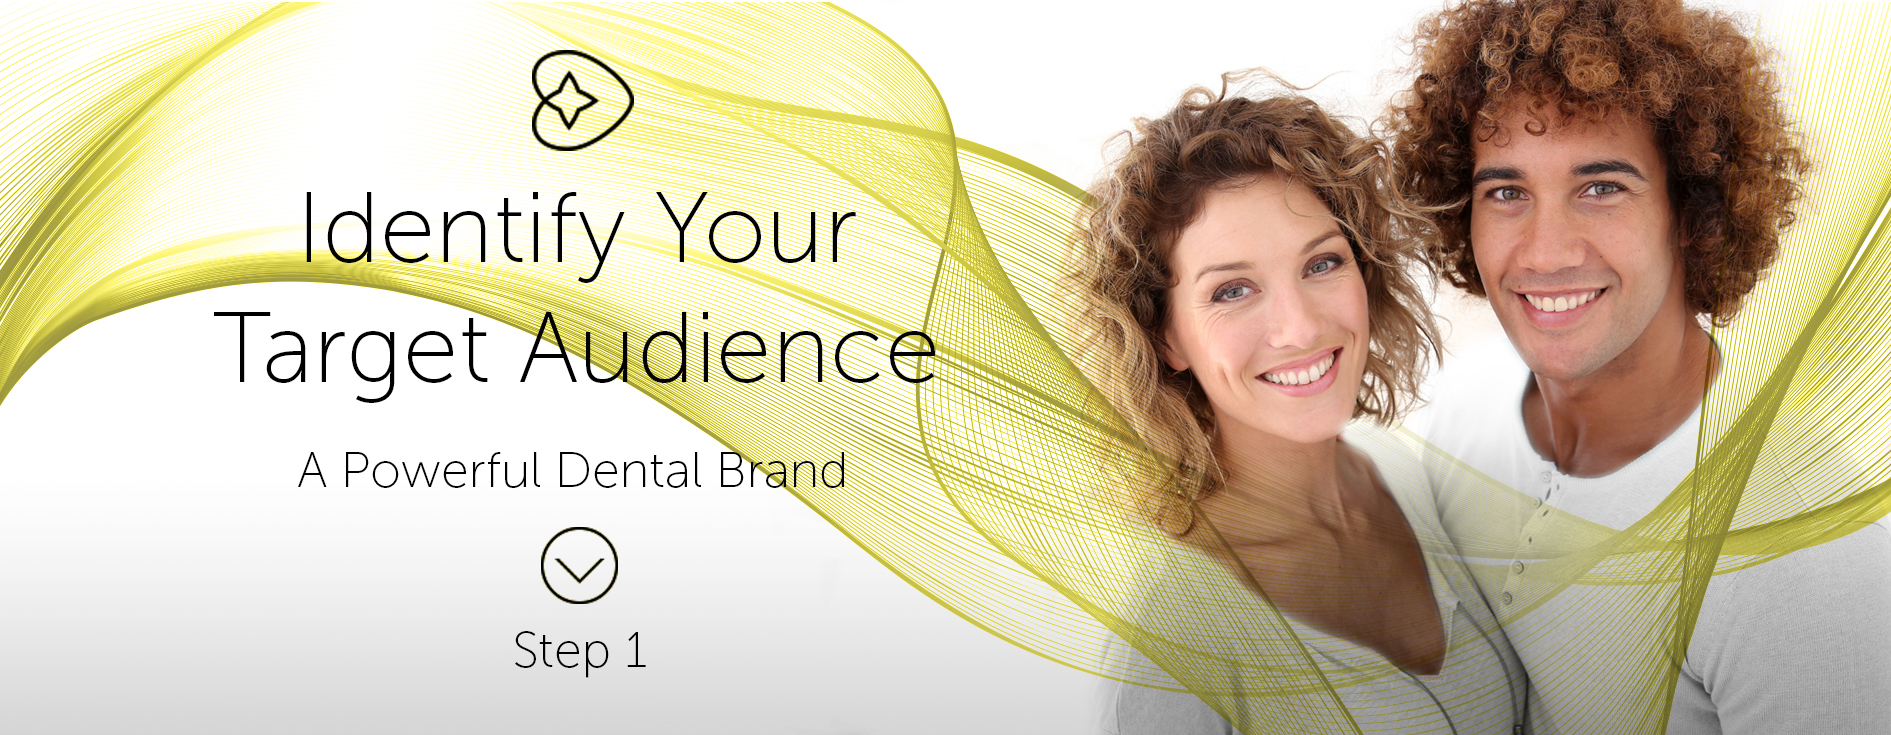 Dental-Branding-Target-Audeince